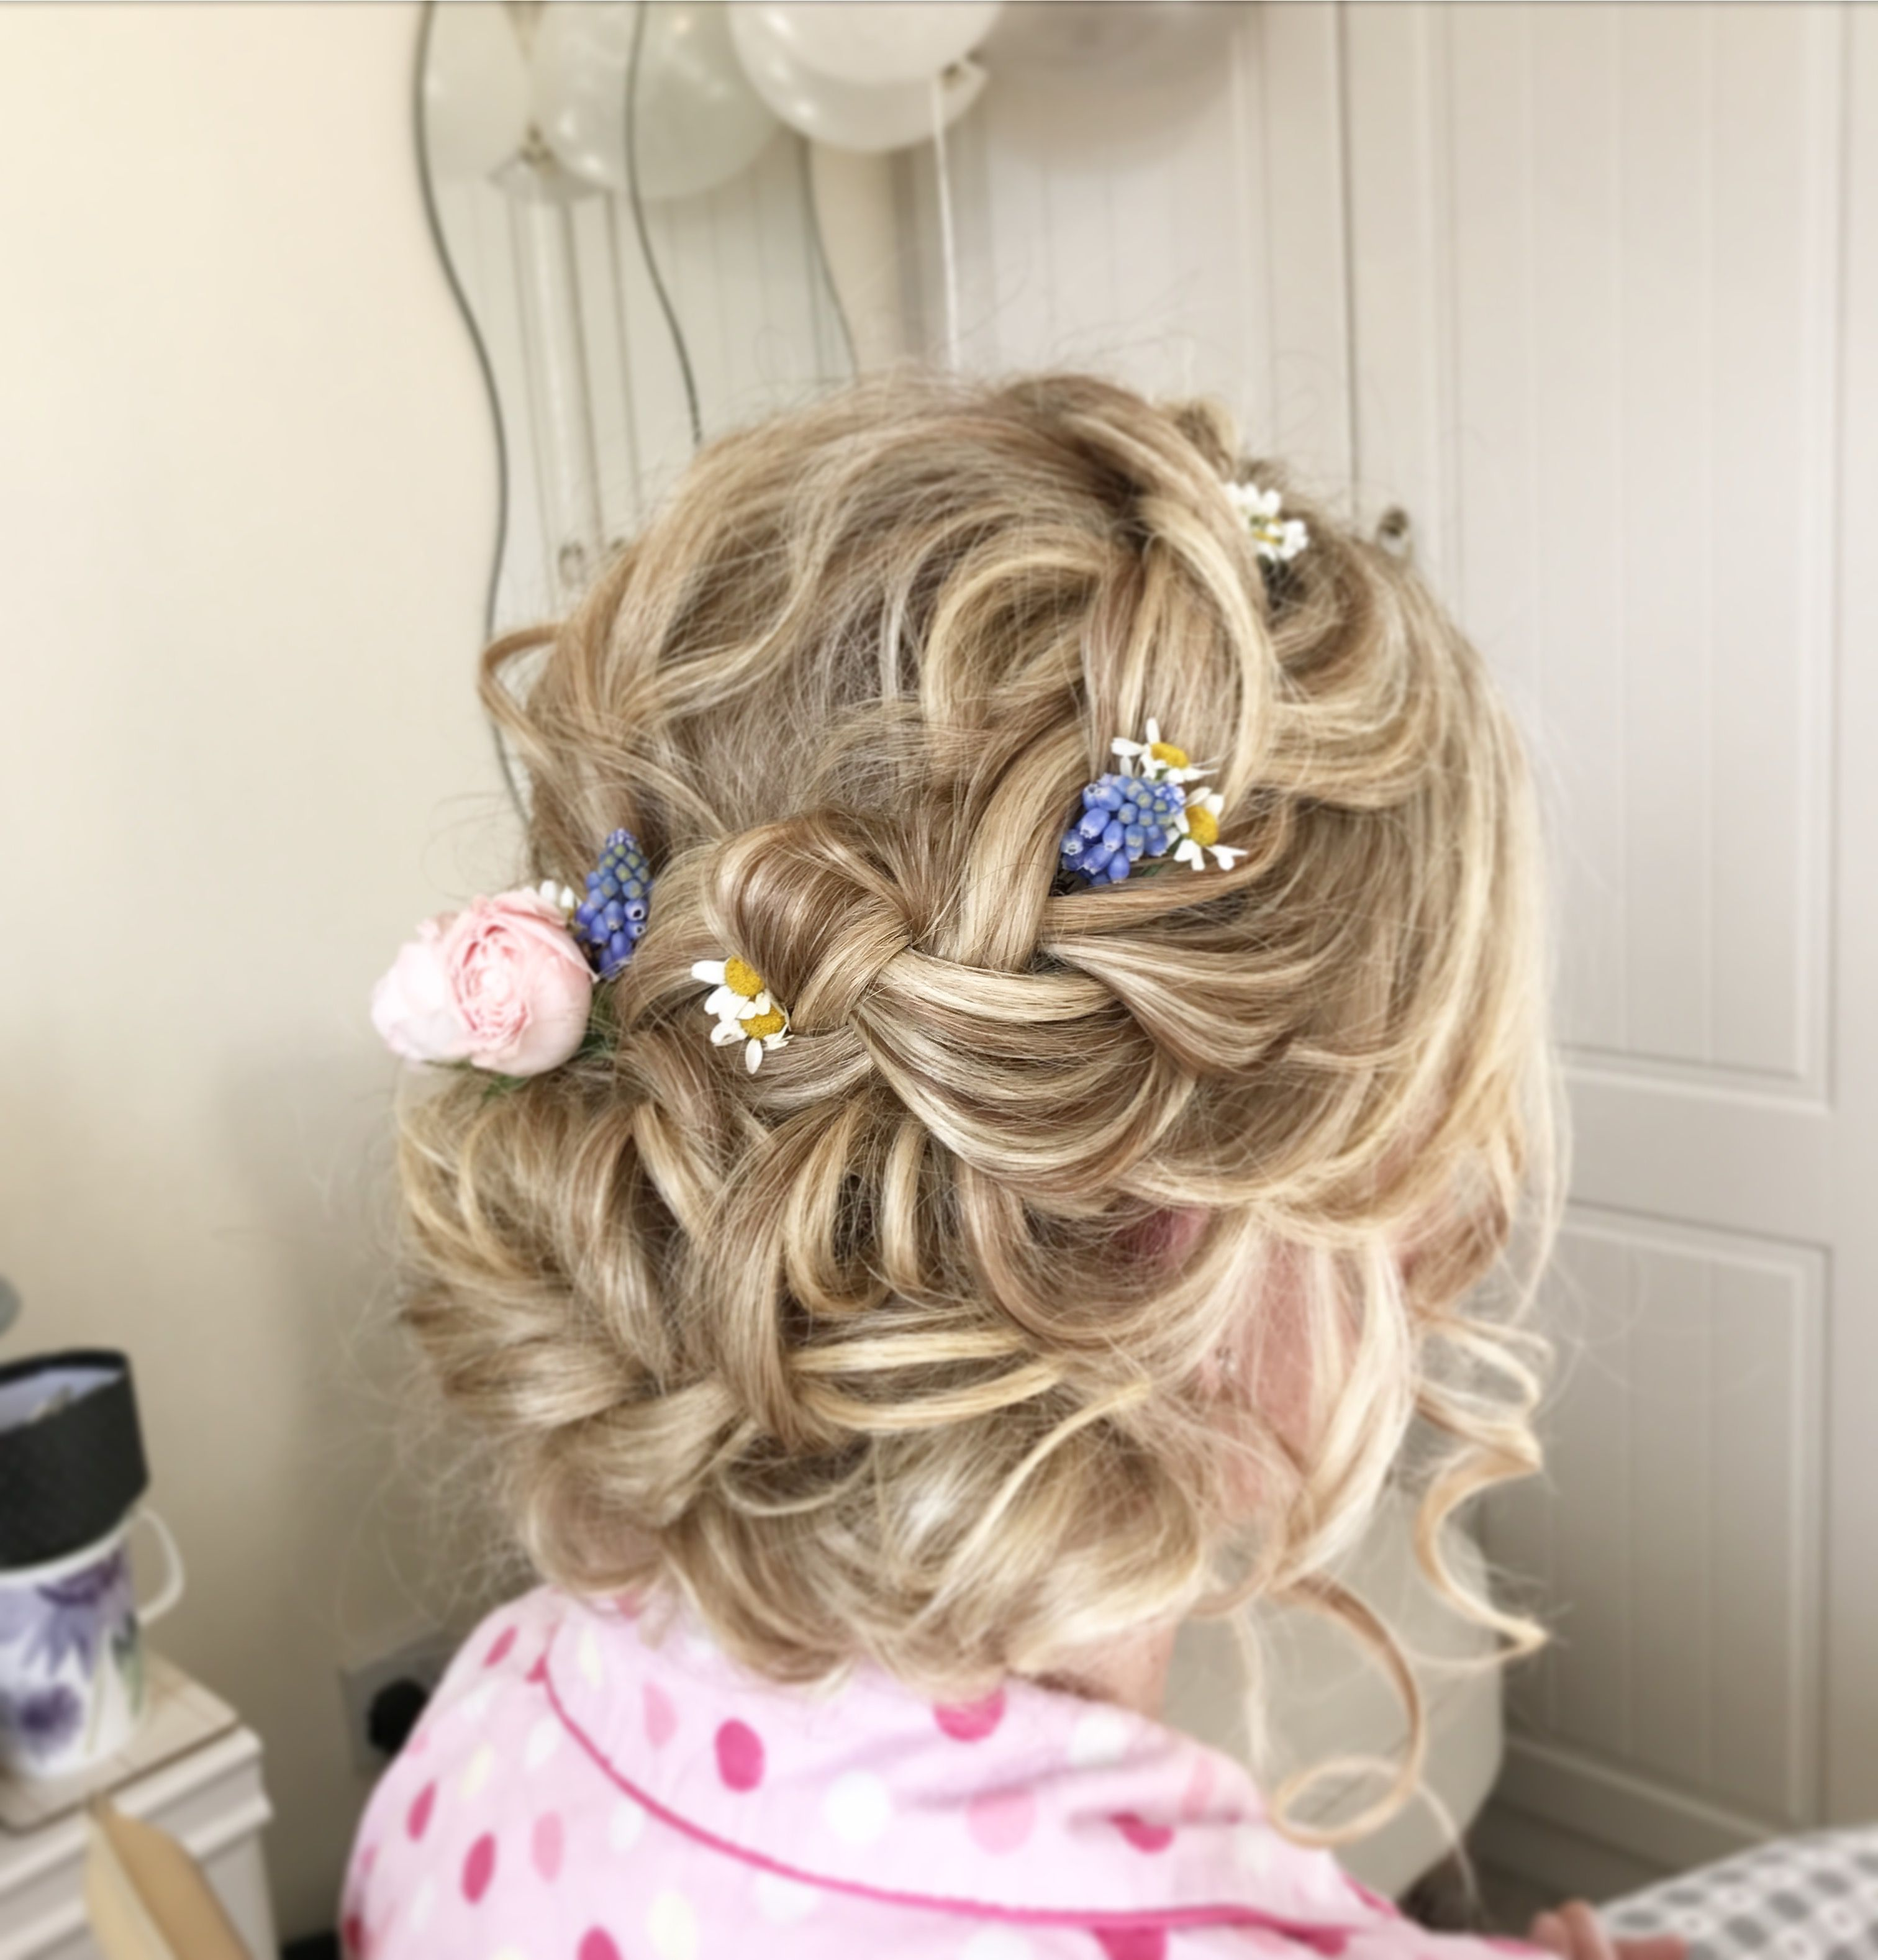 halo-braid wedding hair blonde updo plaits plaited braid braided